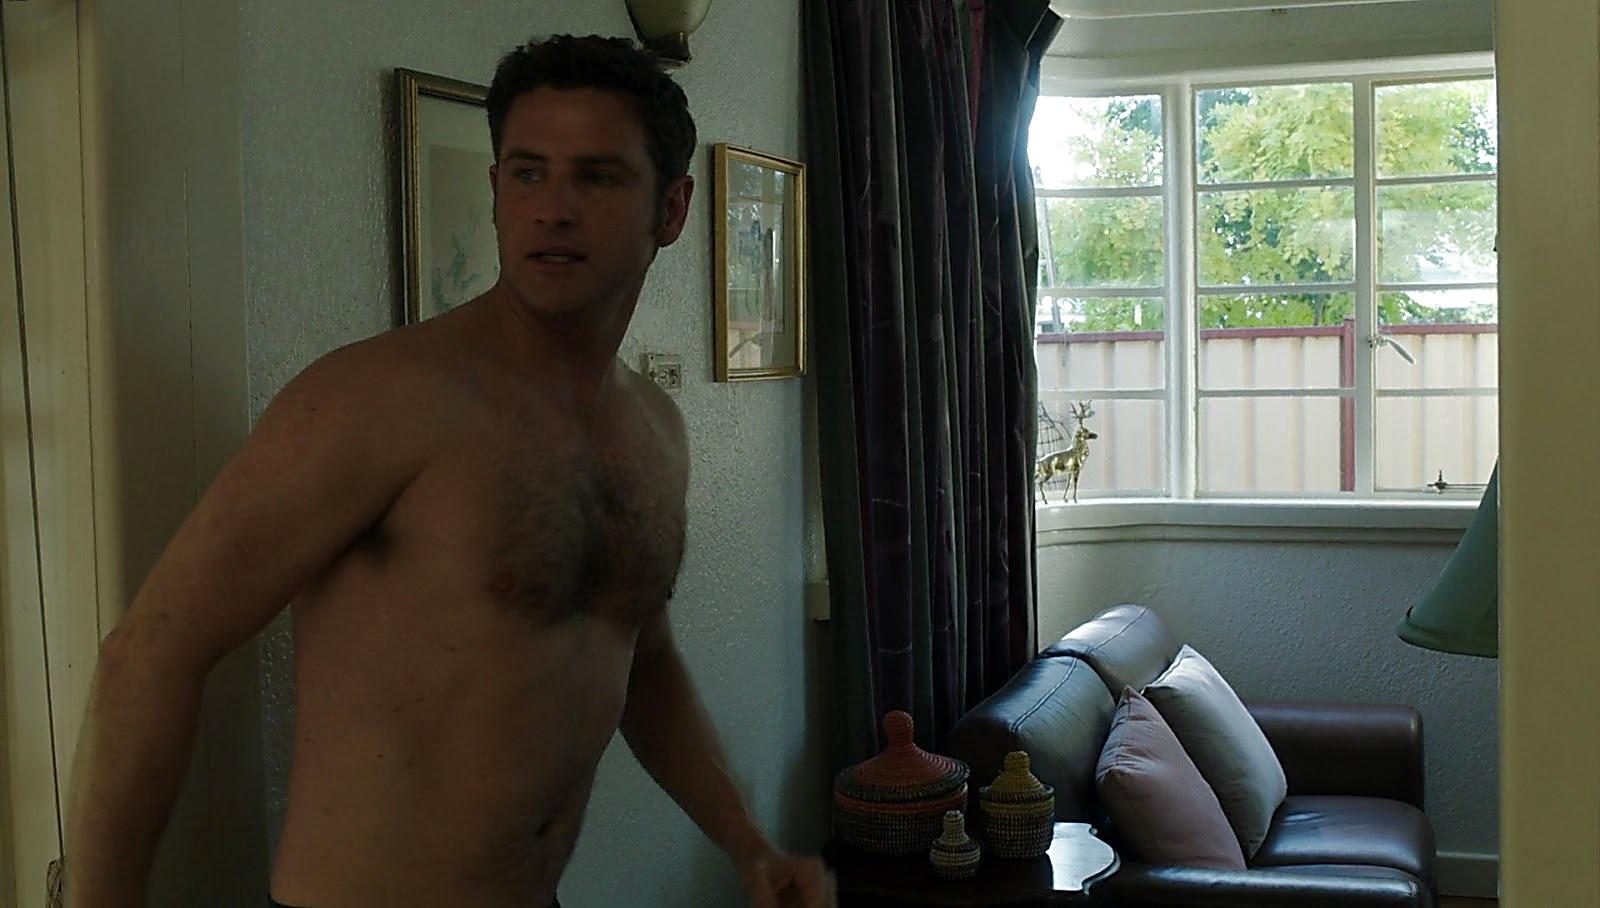 Bernard Curry sexy shirtless scene June 23, 2017, 1pm